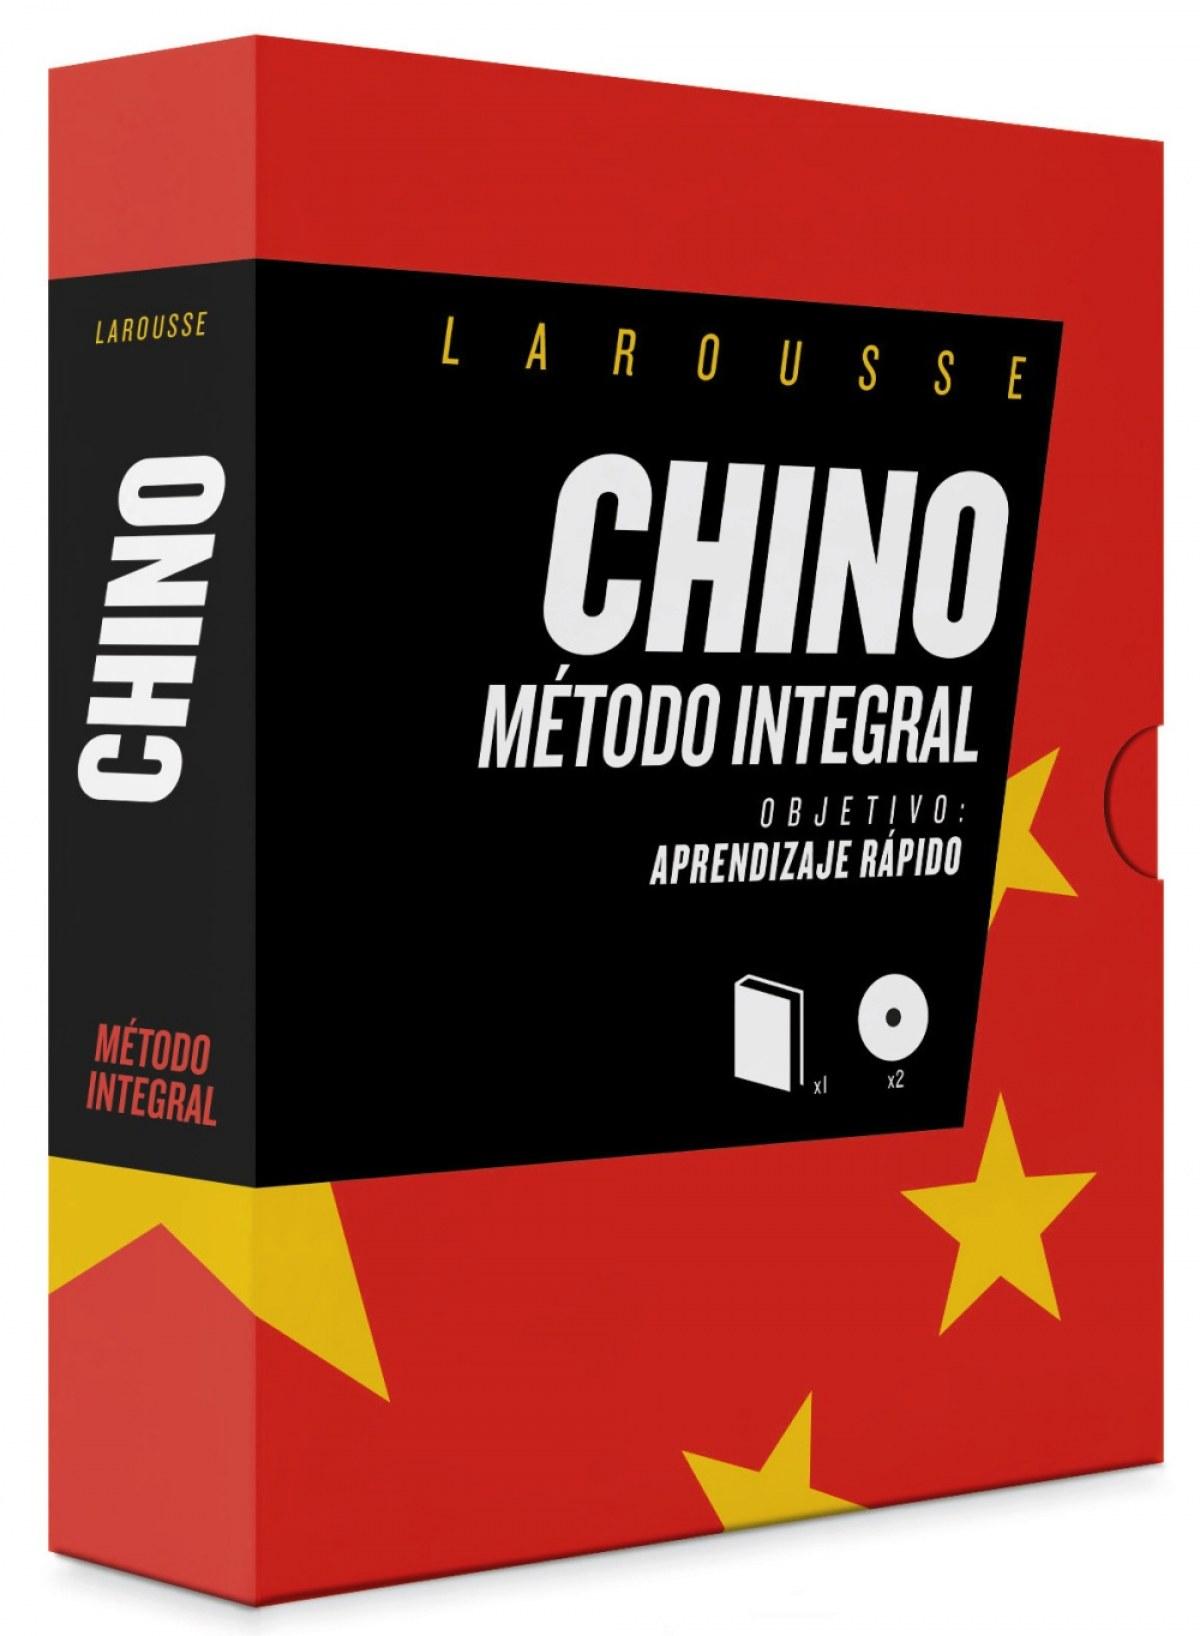 CHINO M�TODO INTEGRAL